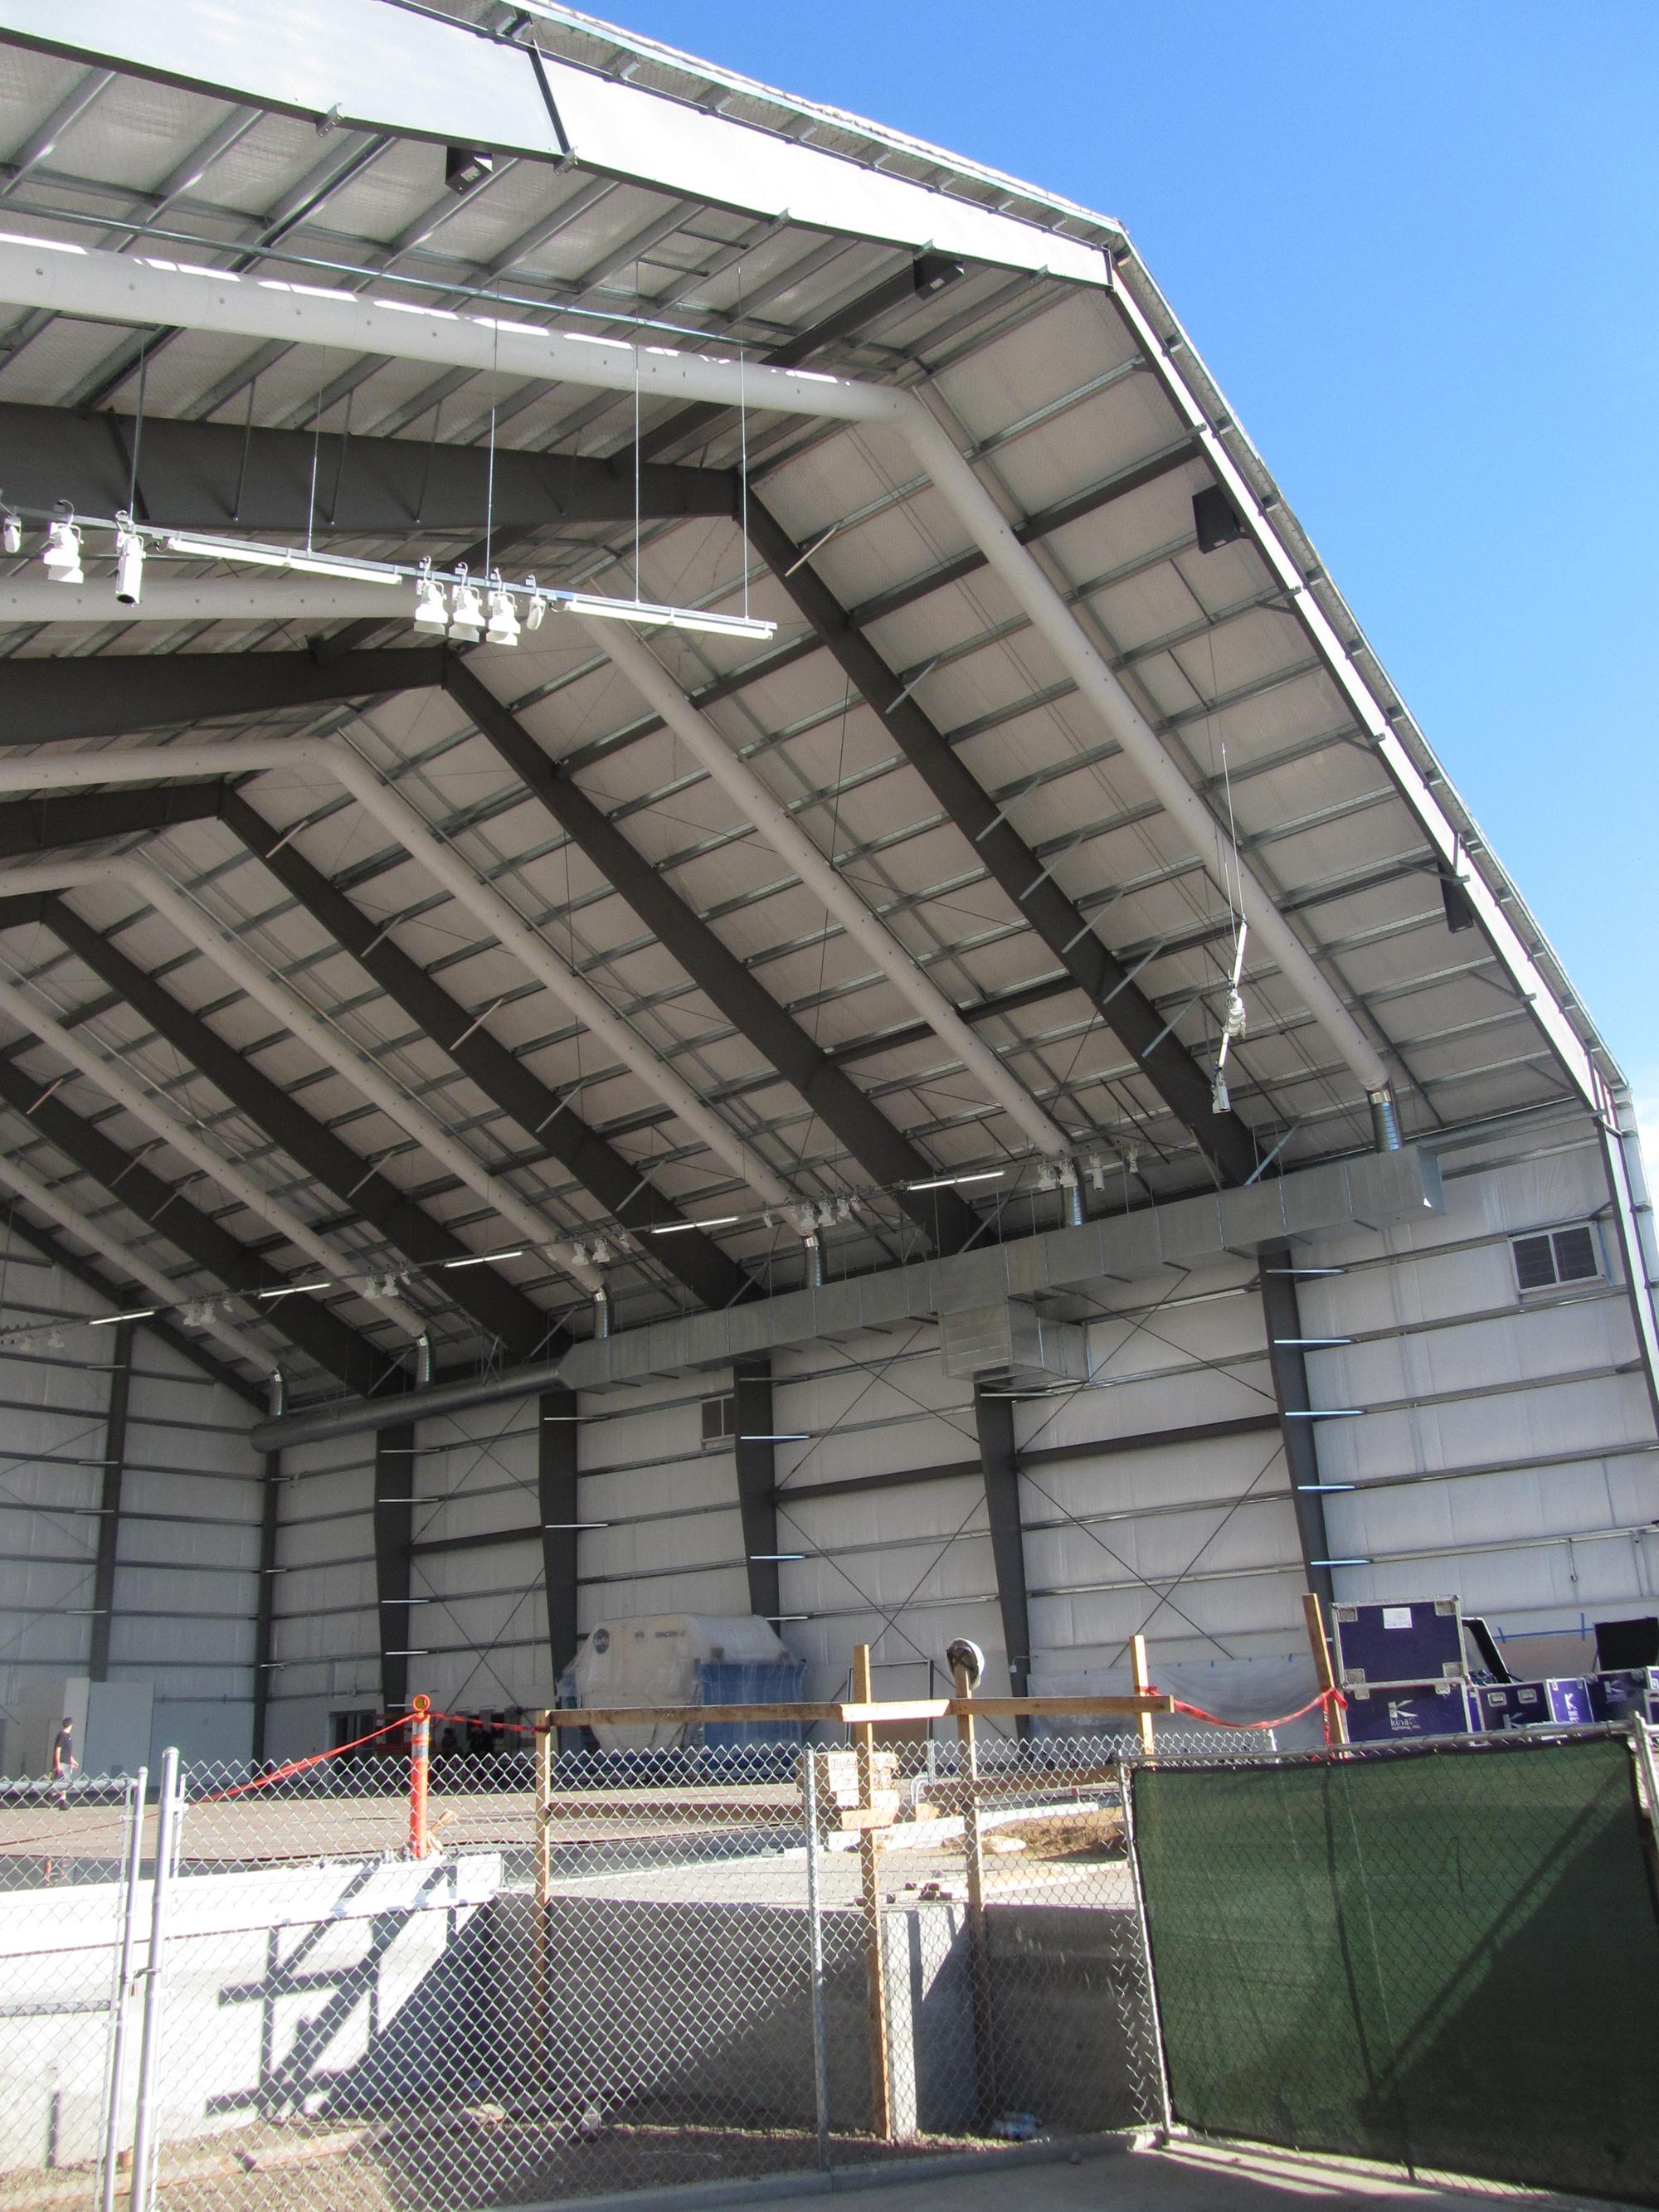 A Look Inside Shuttle Endeavour's Museum Hangar